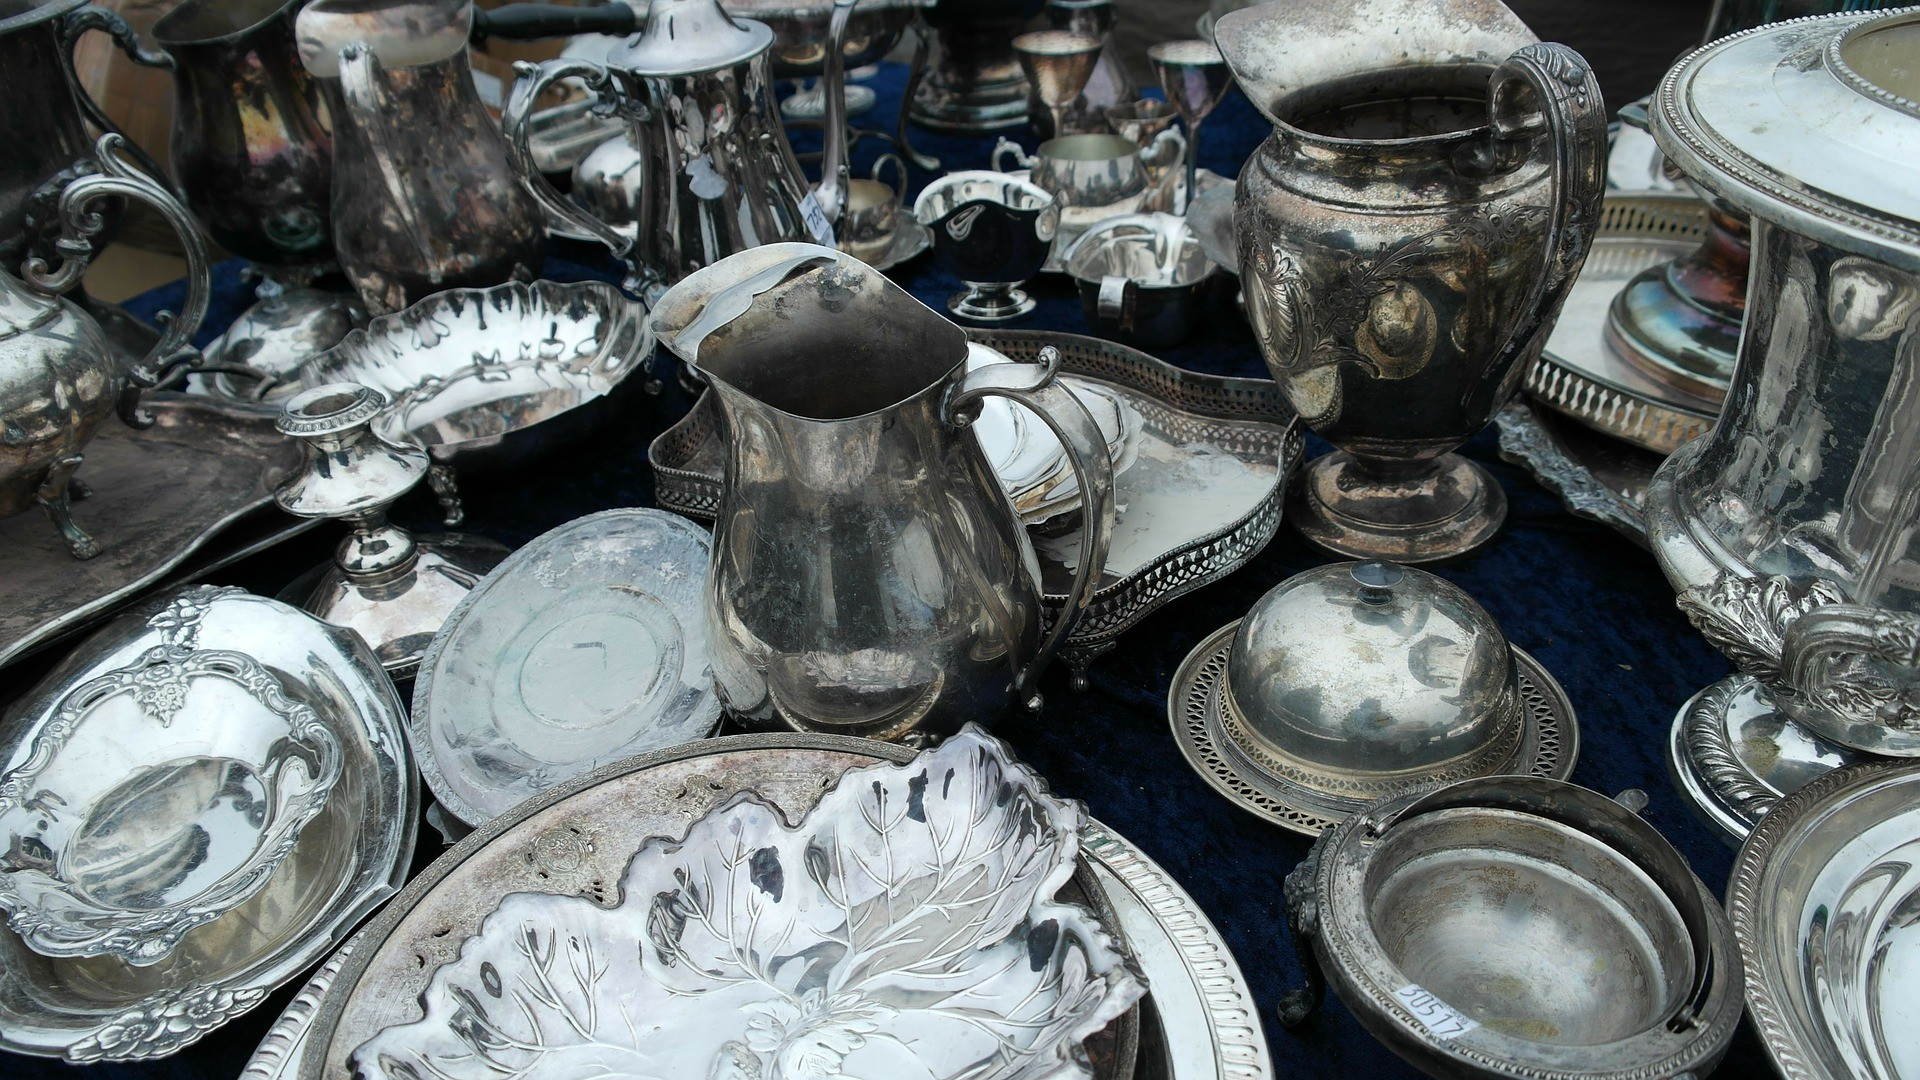 Bermondsey Market, London: Every Friday and Saturday